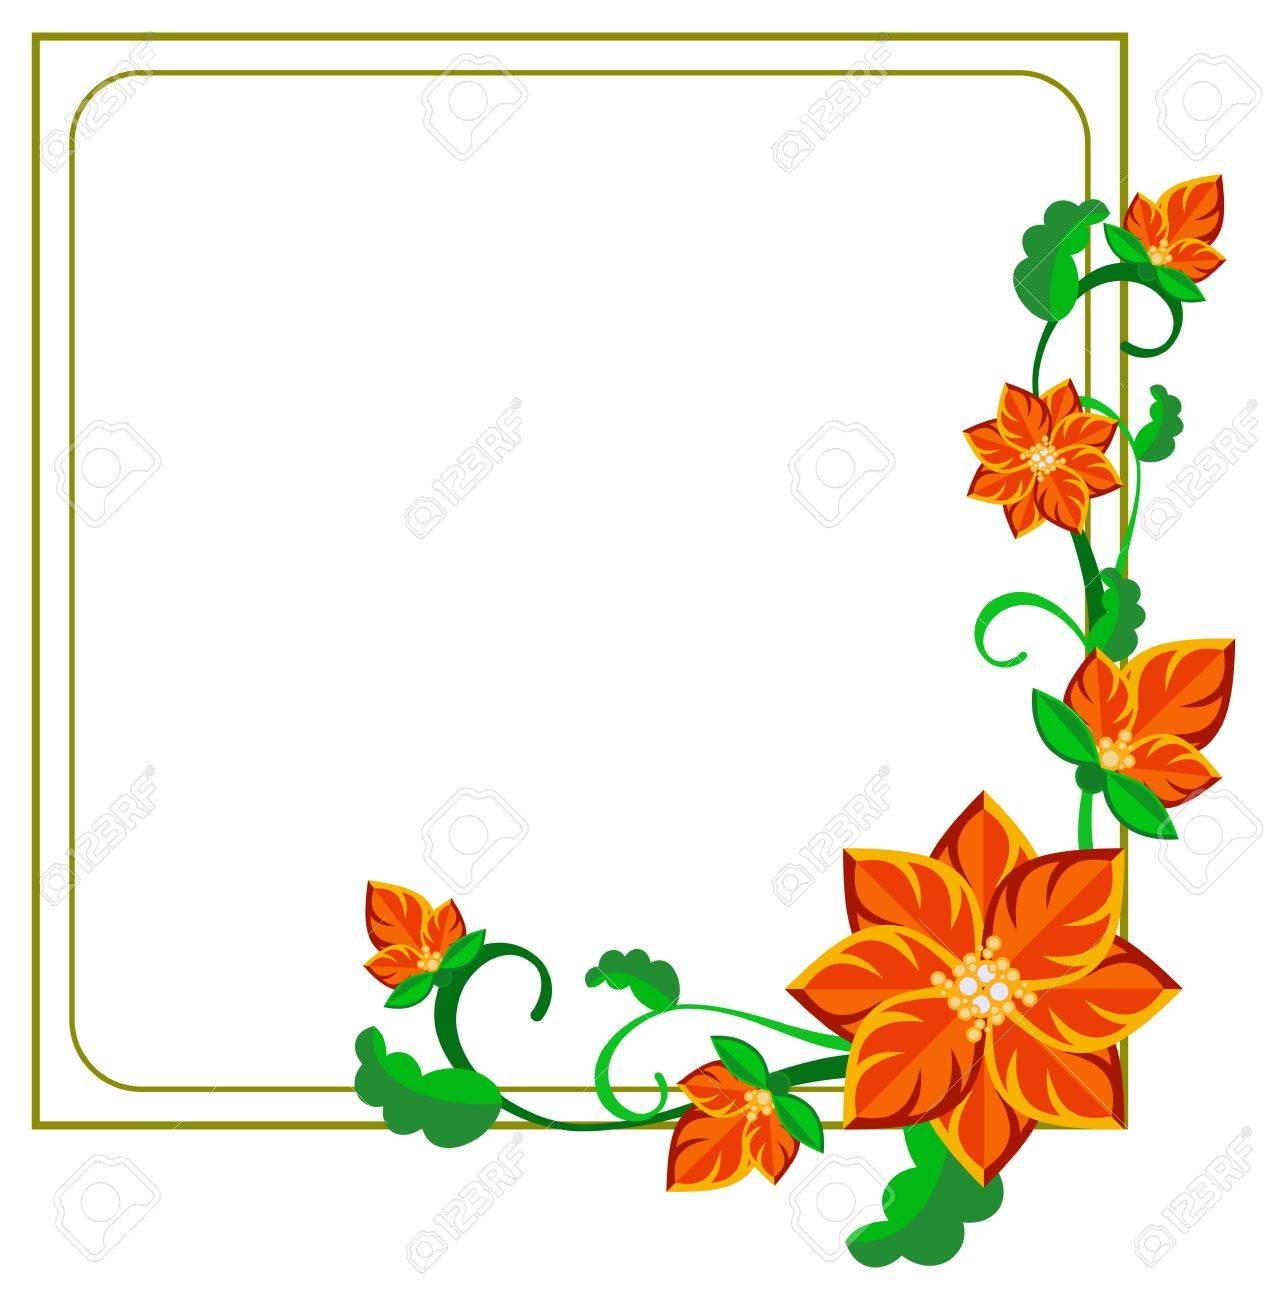 Quadratischer Dekorativer Rahmen Mit Abstrakten Roten Blüten. Vektor ...